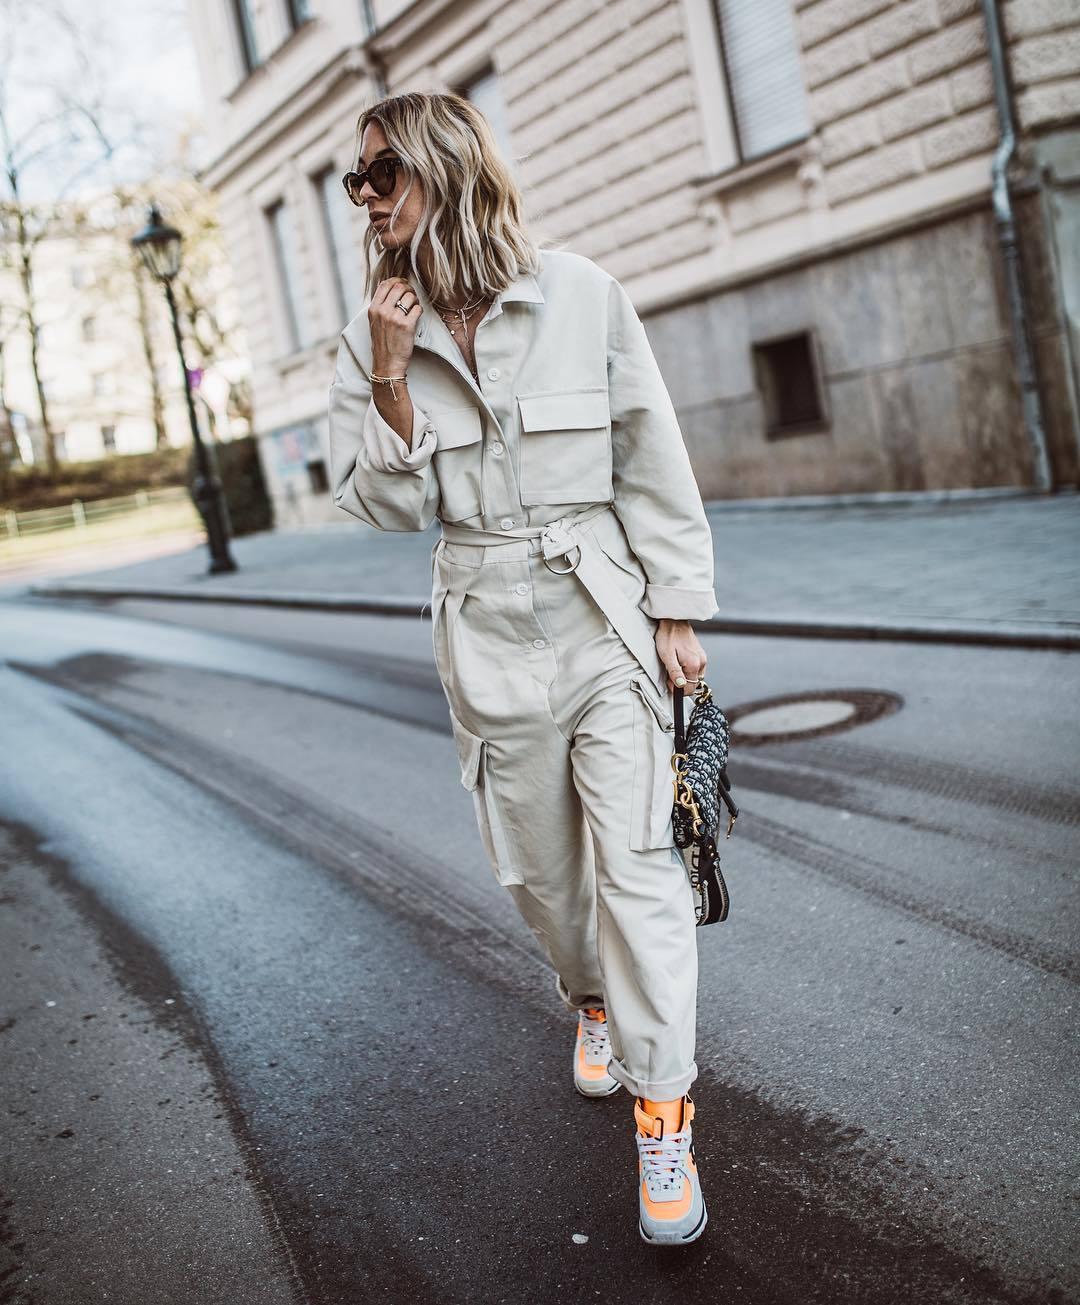 jumpsuit grey jumpsuit sneakers dior bag sunglasses casual streetwear